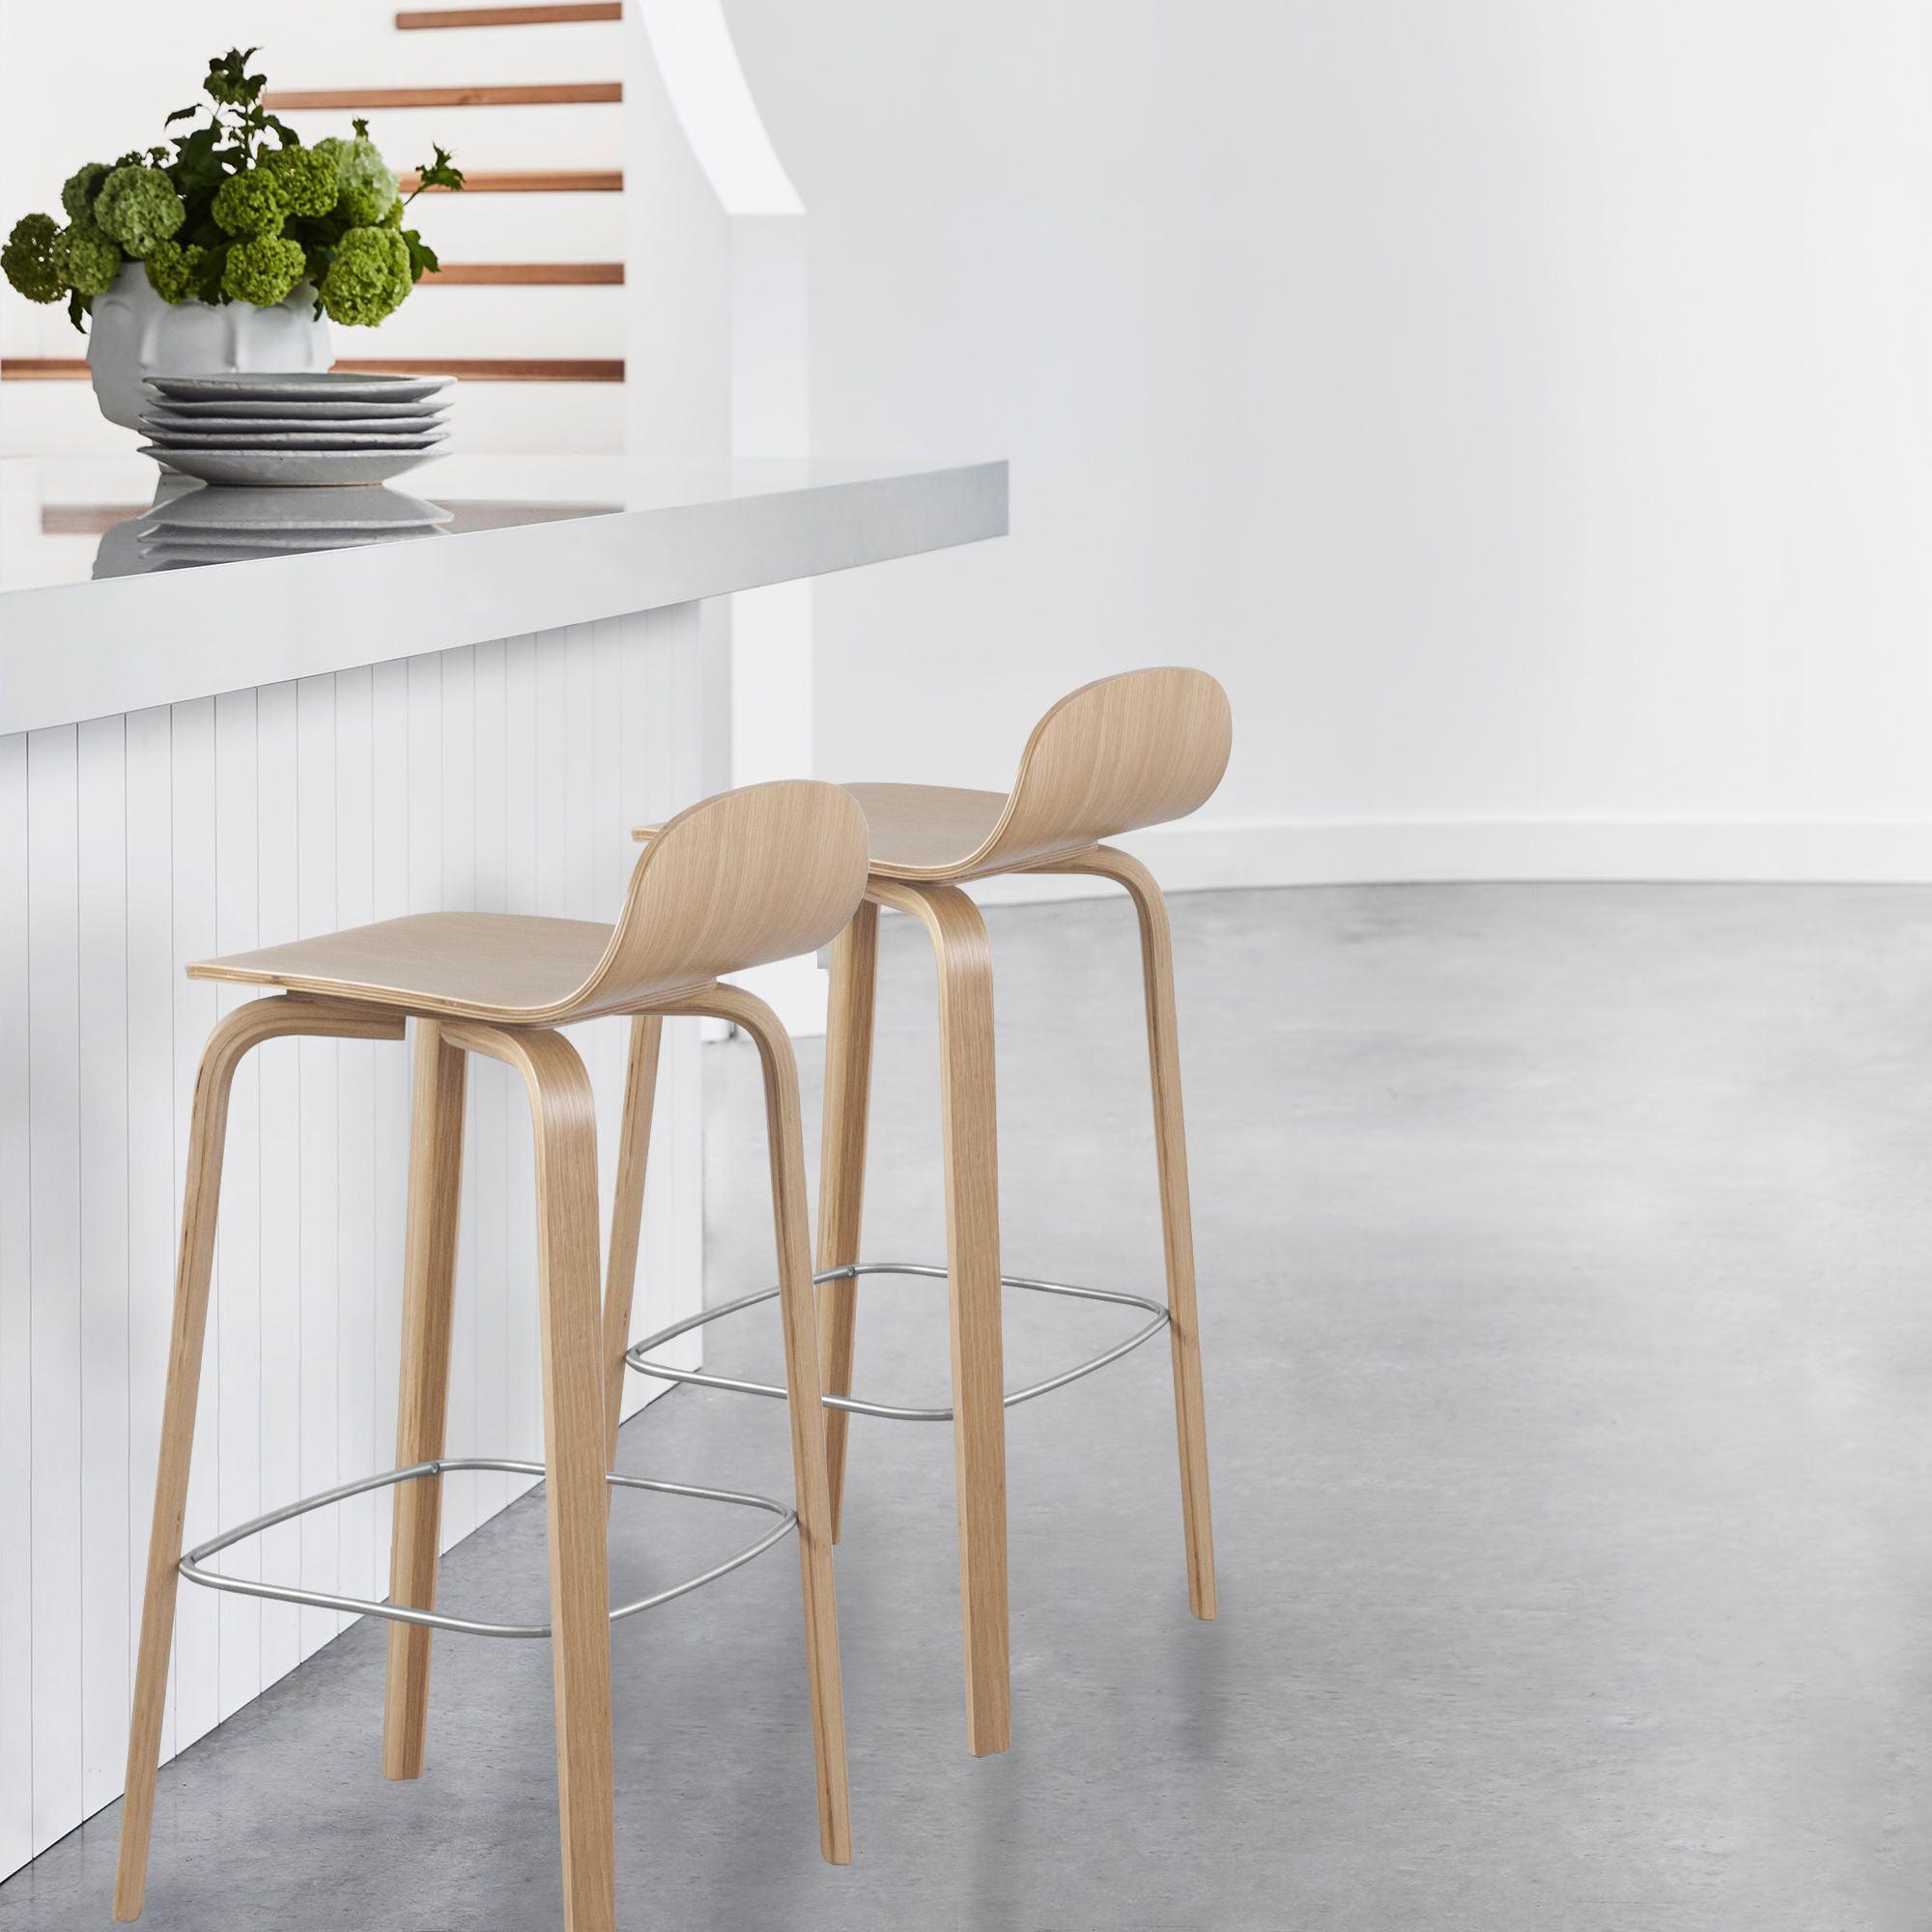 Image of: Glen Contract Grade Modern Wooden Bar Stool 27 Inch Seat Walmart Canada